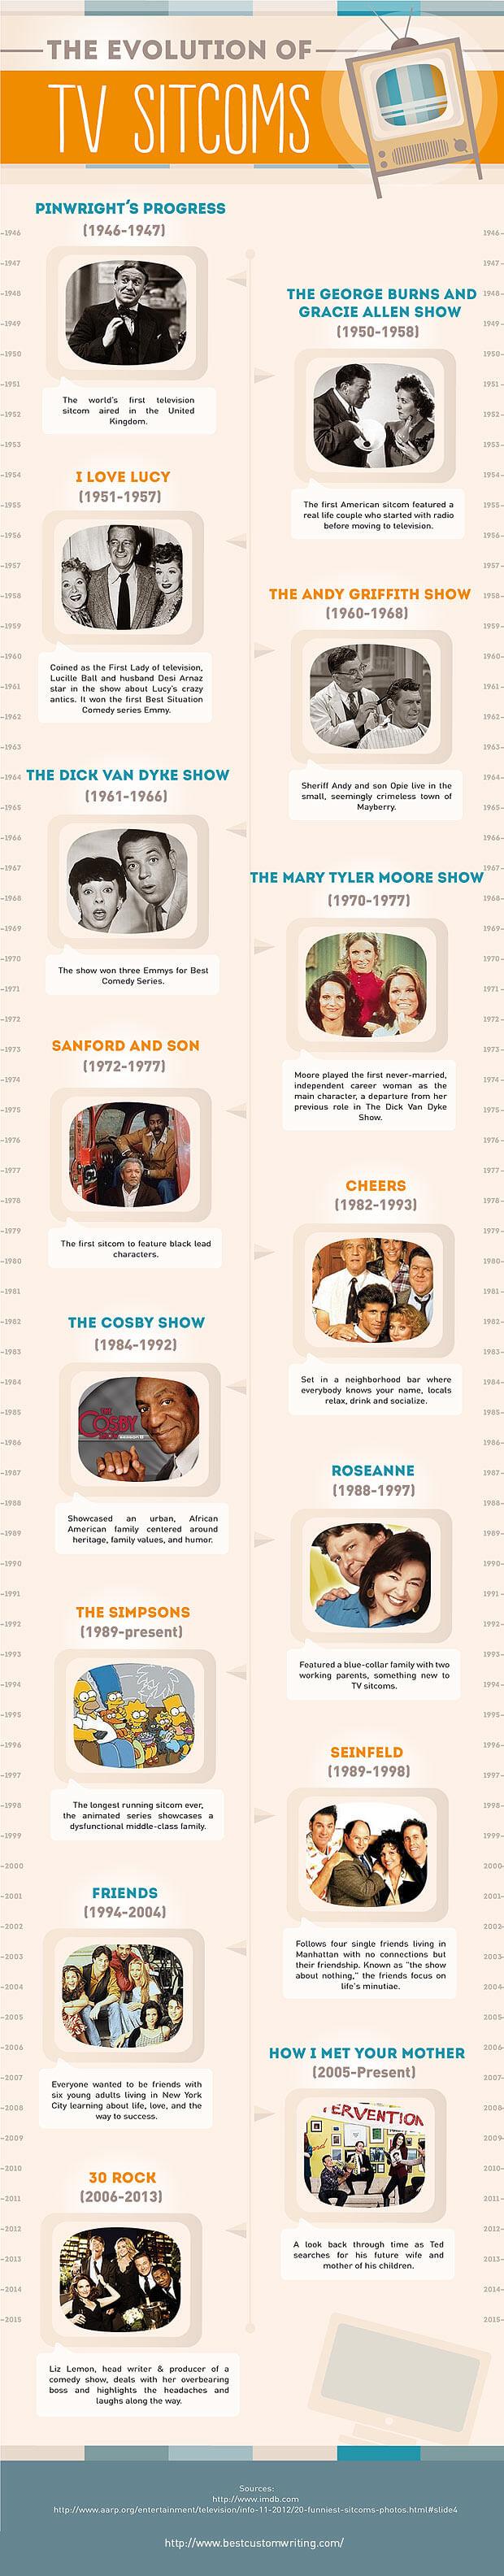 The evolution of TV sitcoms